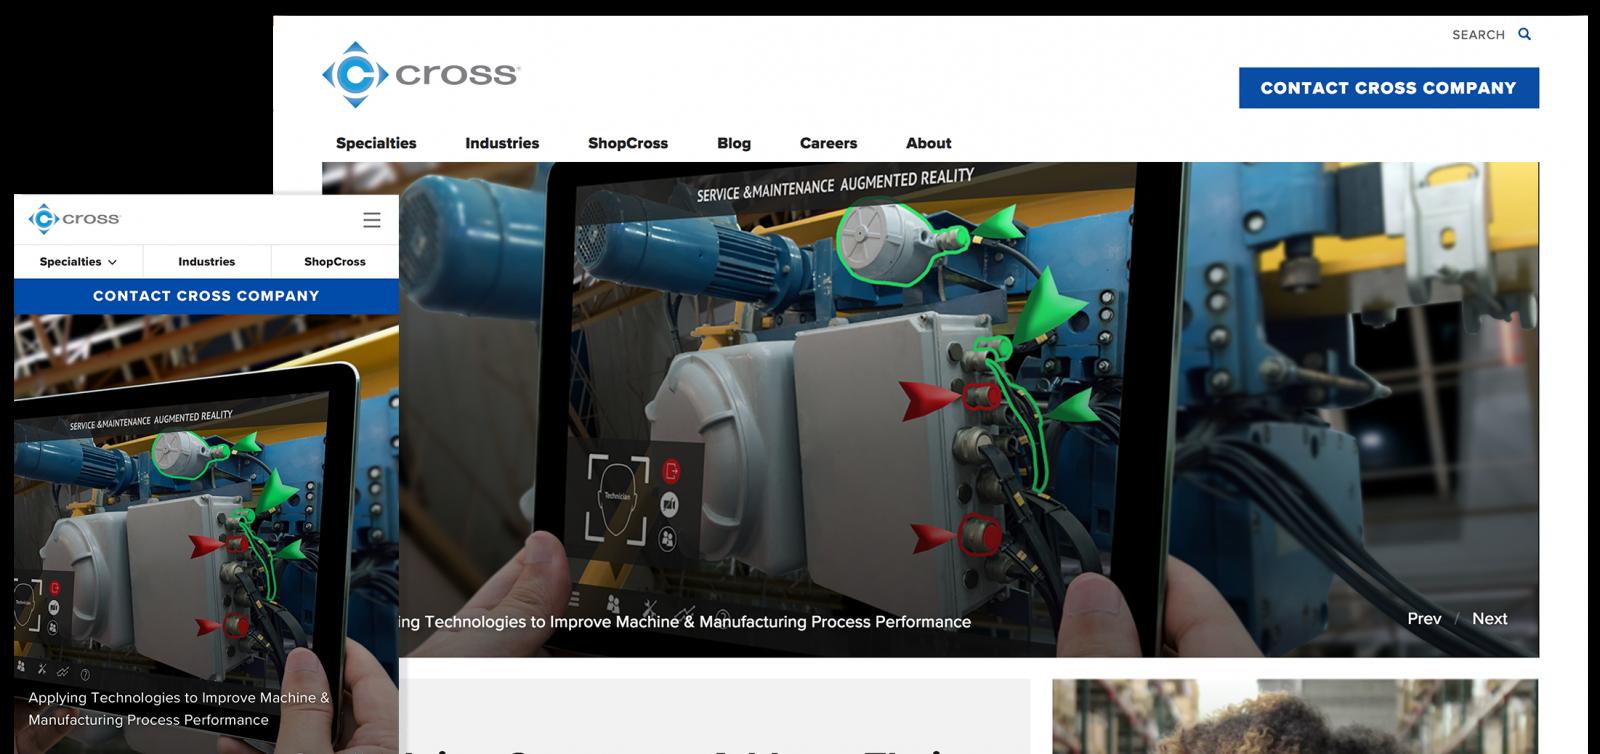 Cross website screenshots